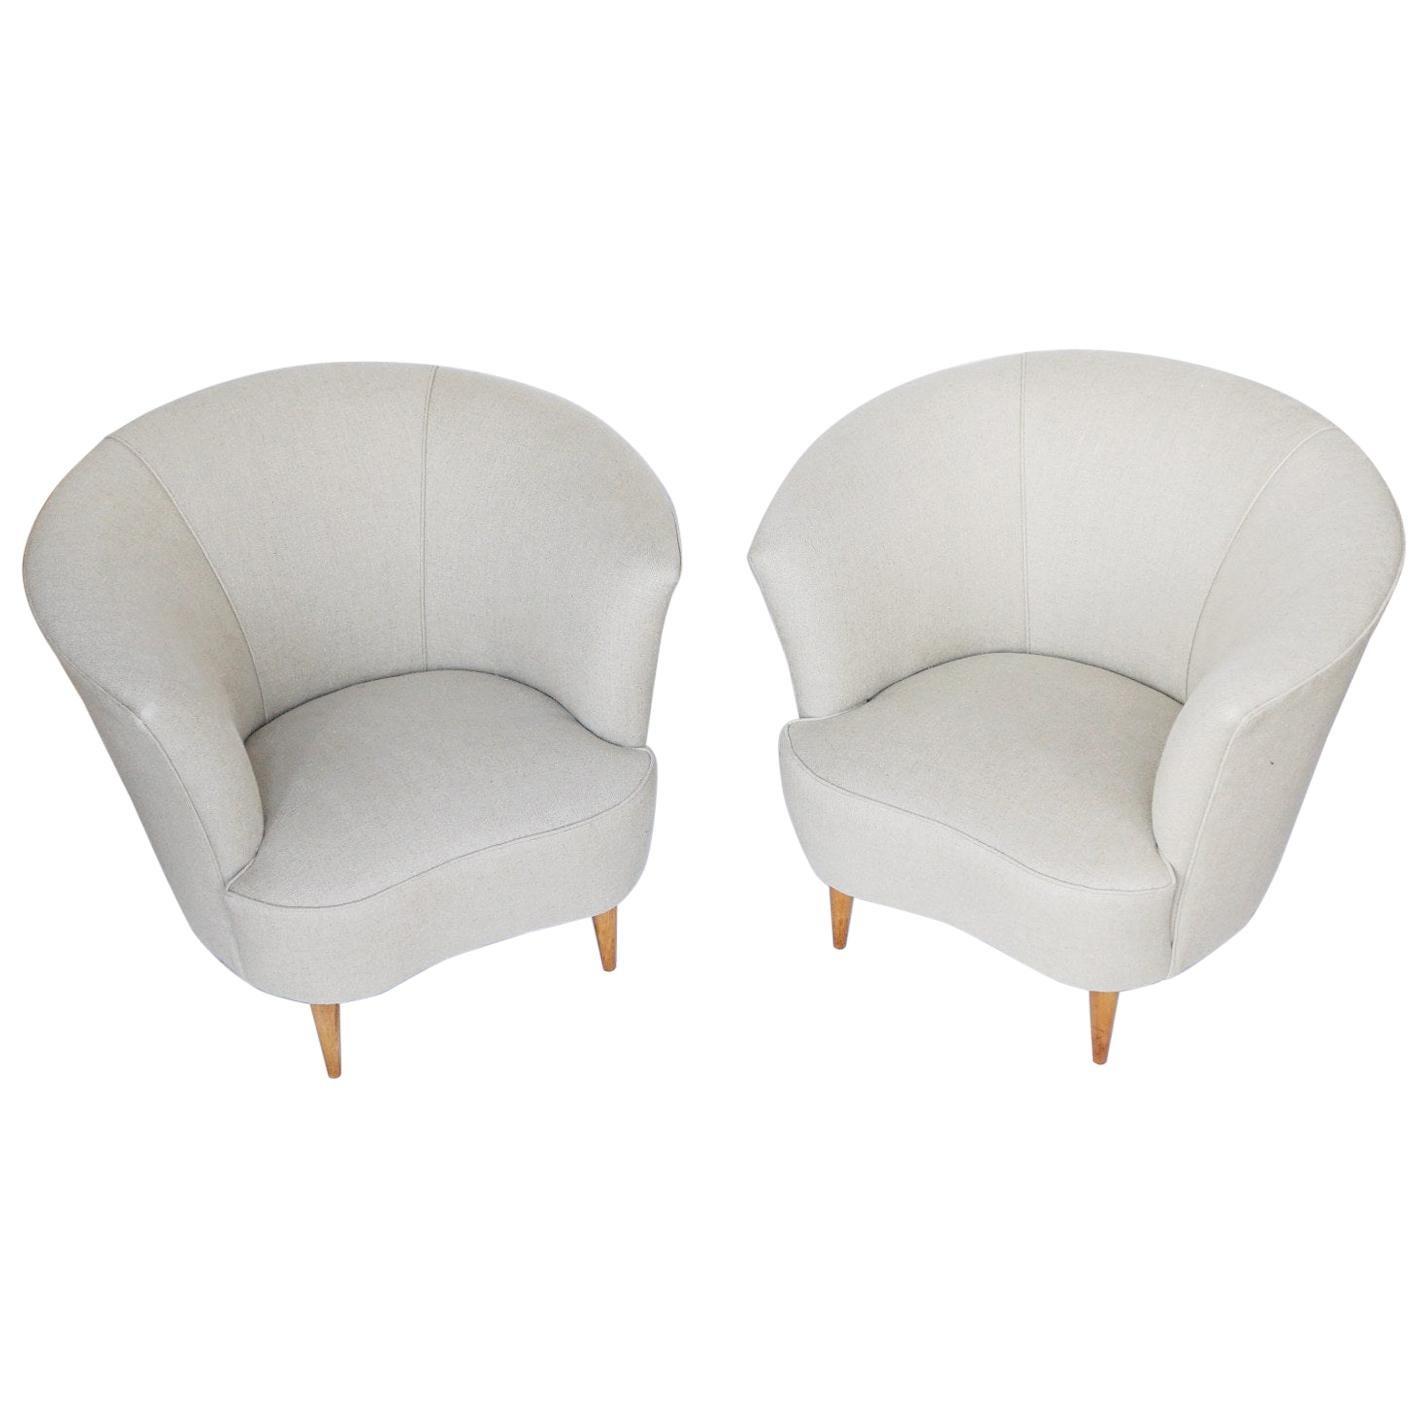 Pair of Midcentury Chairs Attributed to Gio Ponti Italian, circa 1950